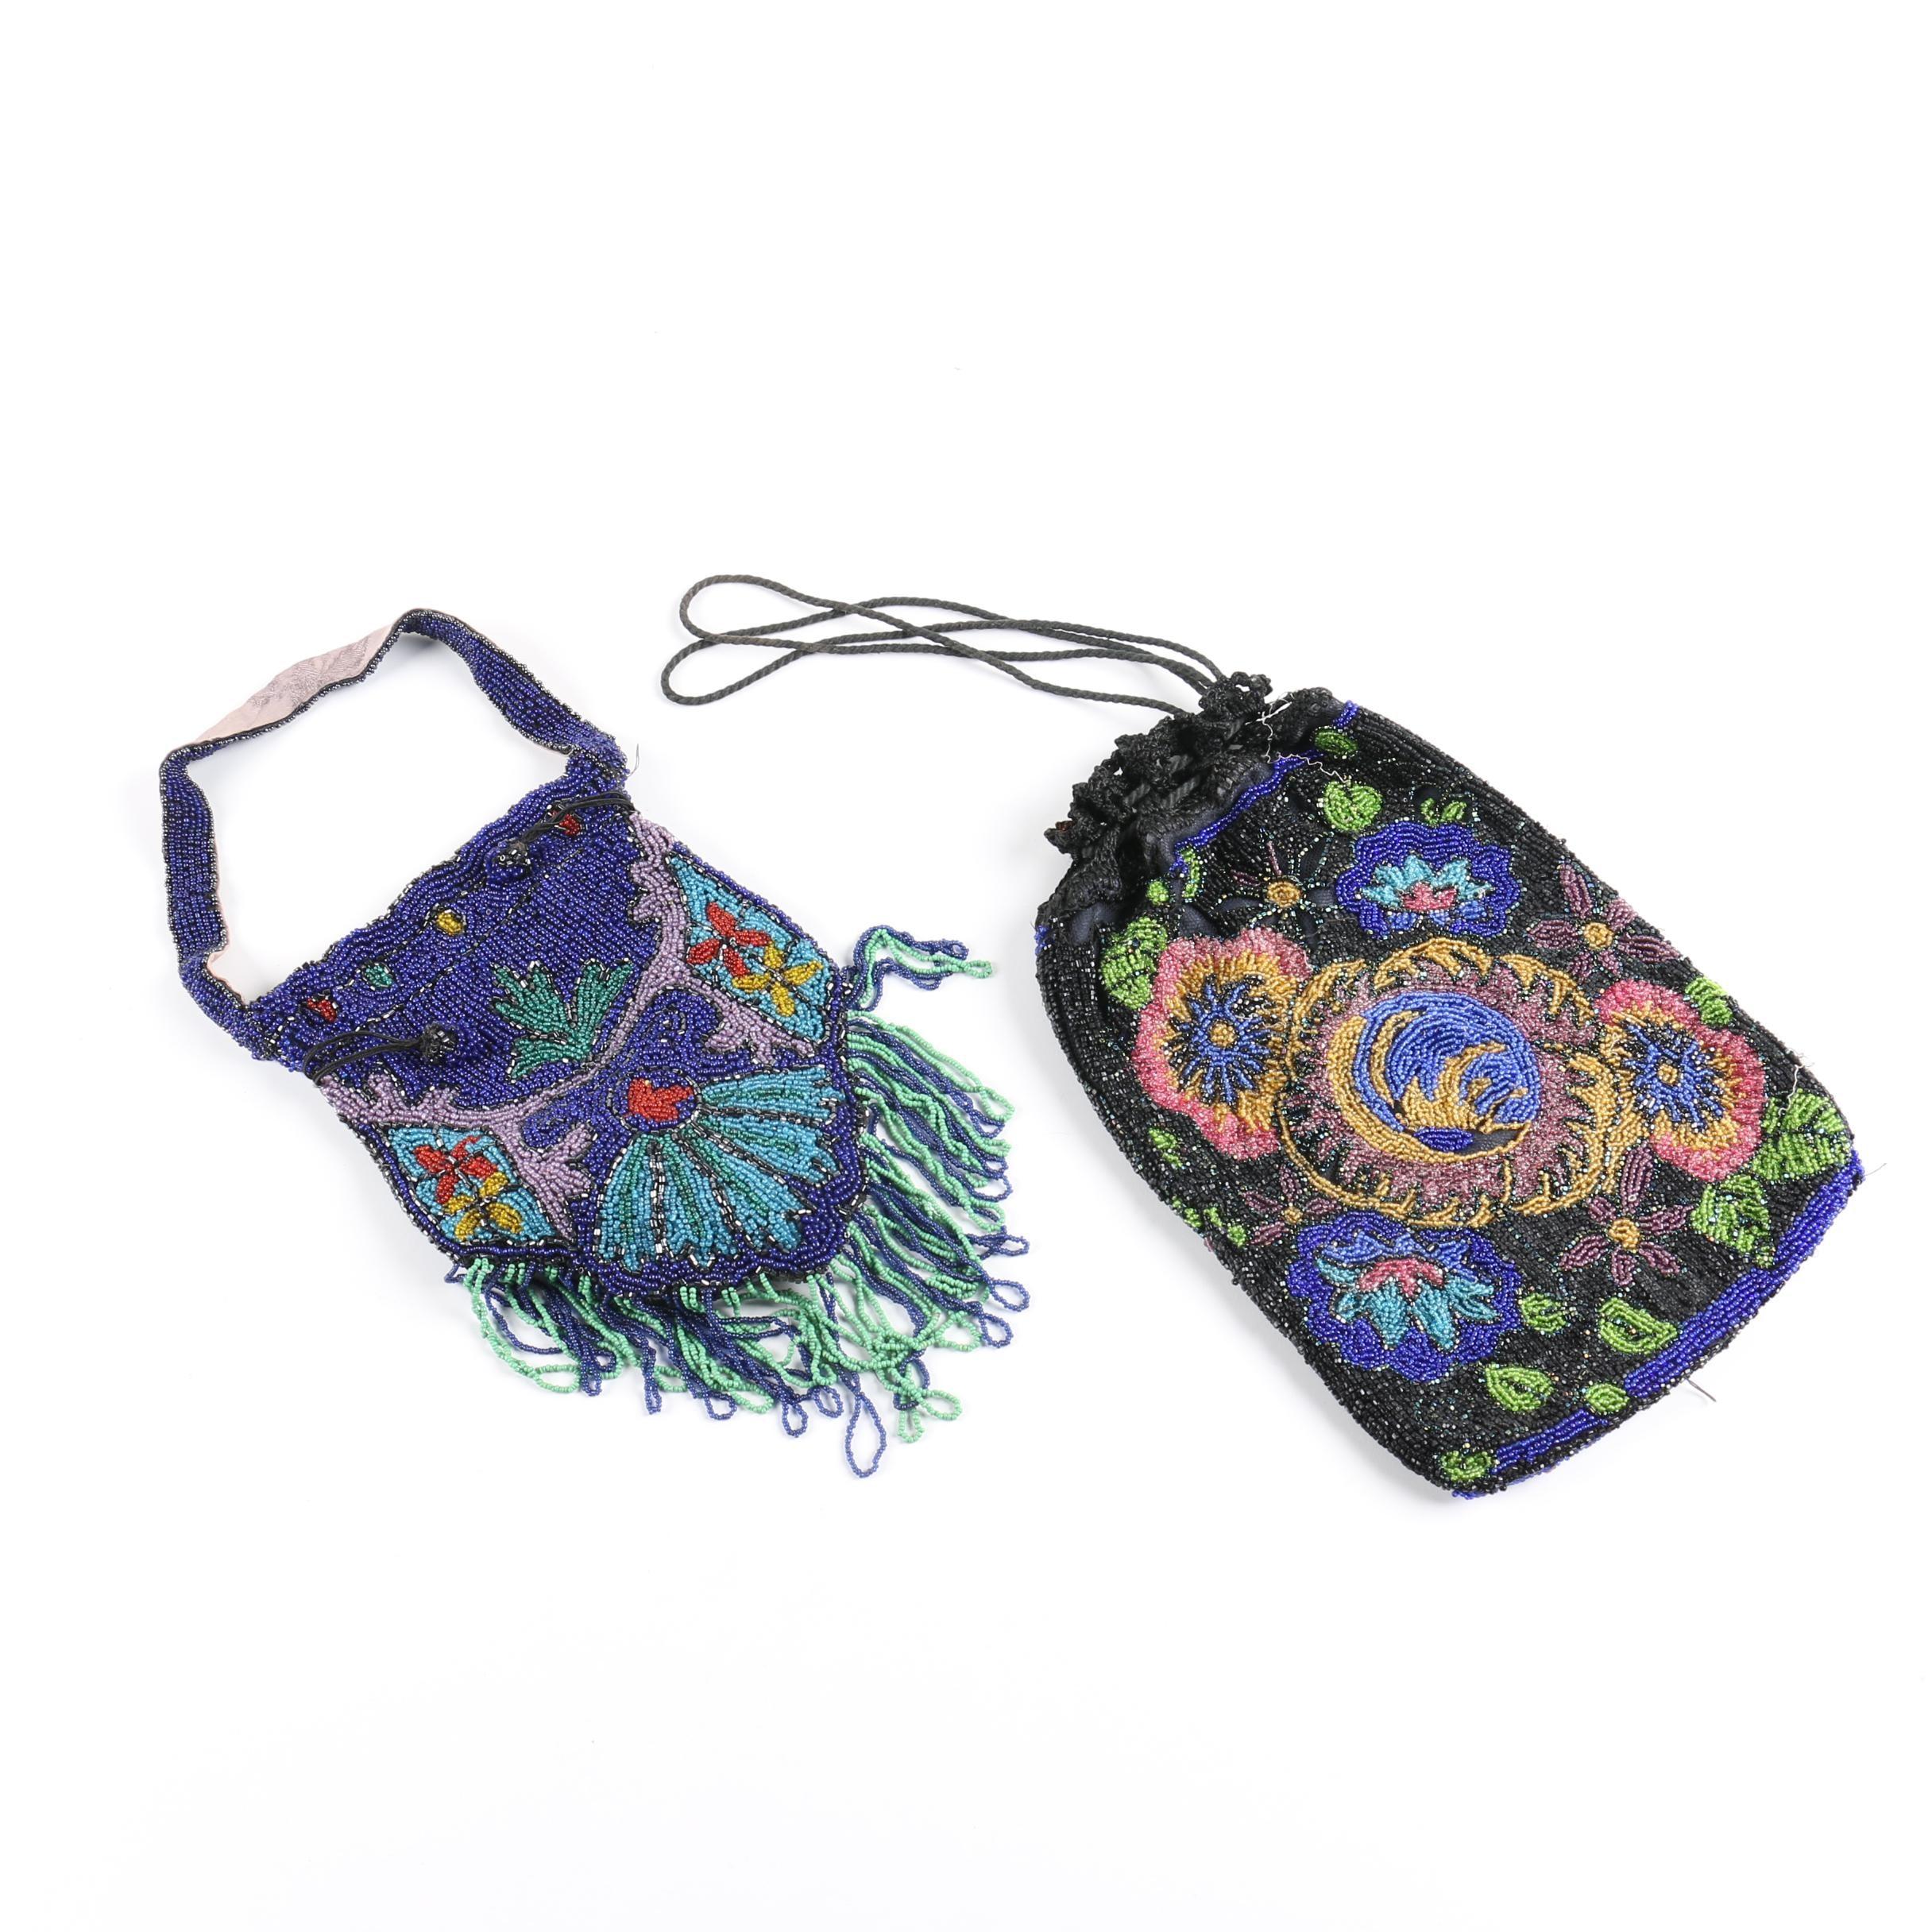 Ornate Beaded Handbags